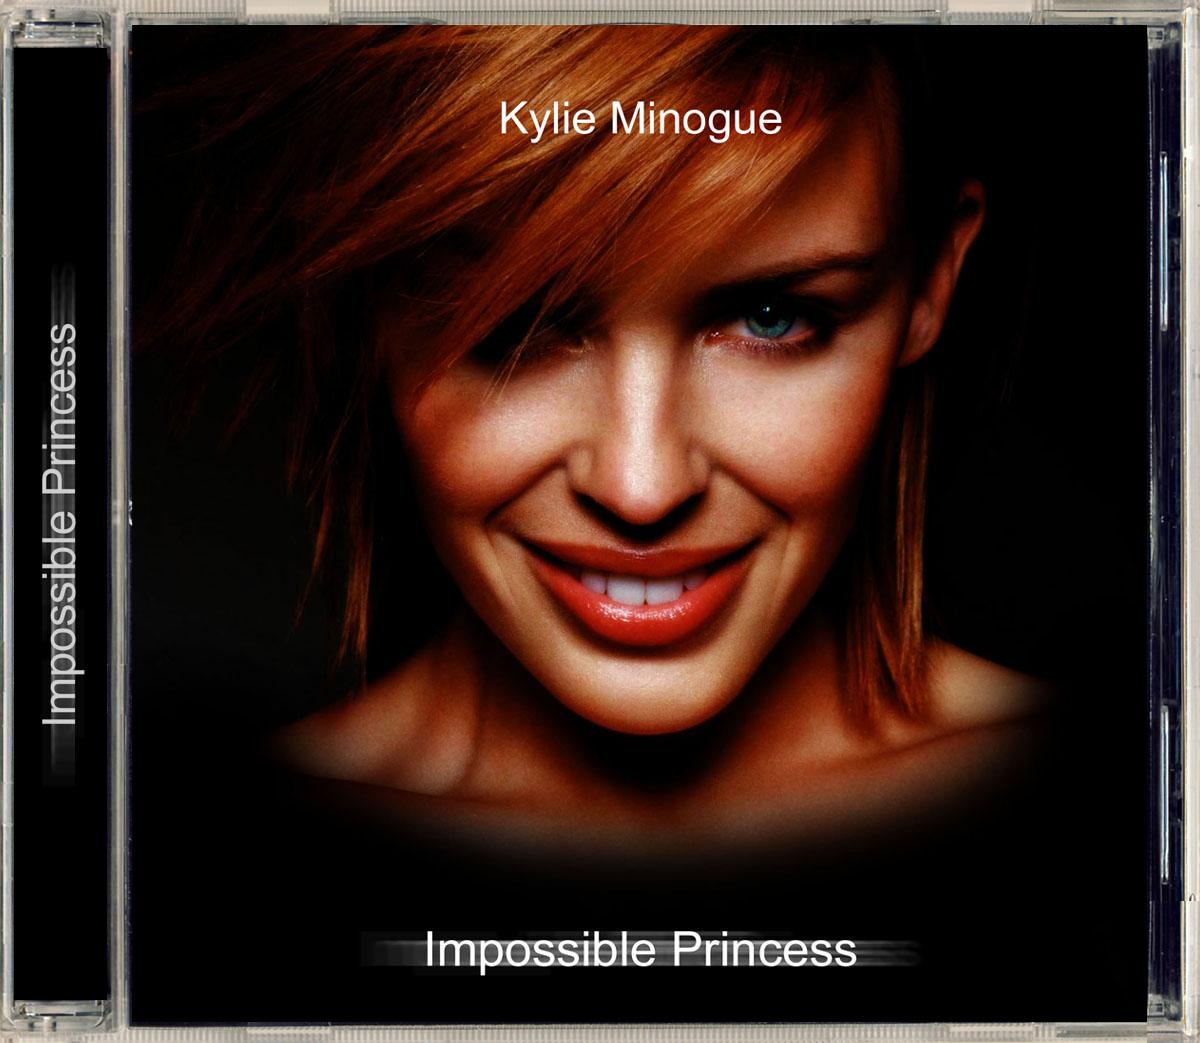 http://1.bp.blogspot.com/_sswWnMT7R-8/Swgj1IhqSPI/AAAAAAAAA3E/NVFFIHGu3OY/s1600/cd+Impossible+princess.jpg